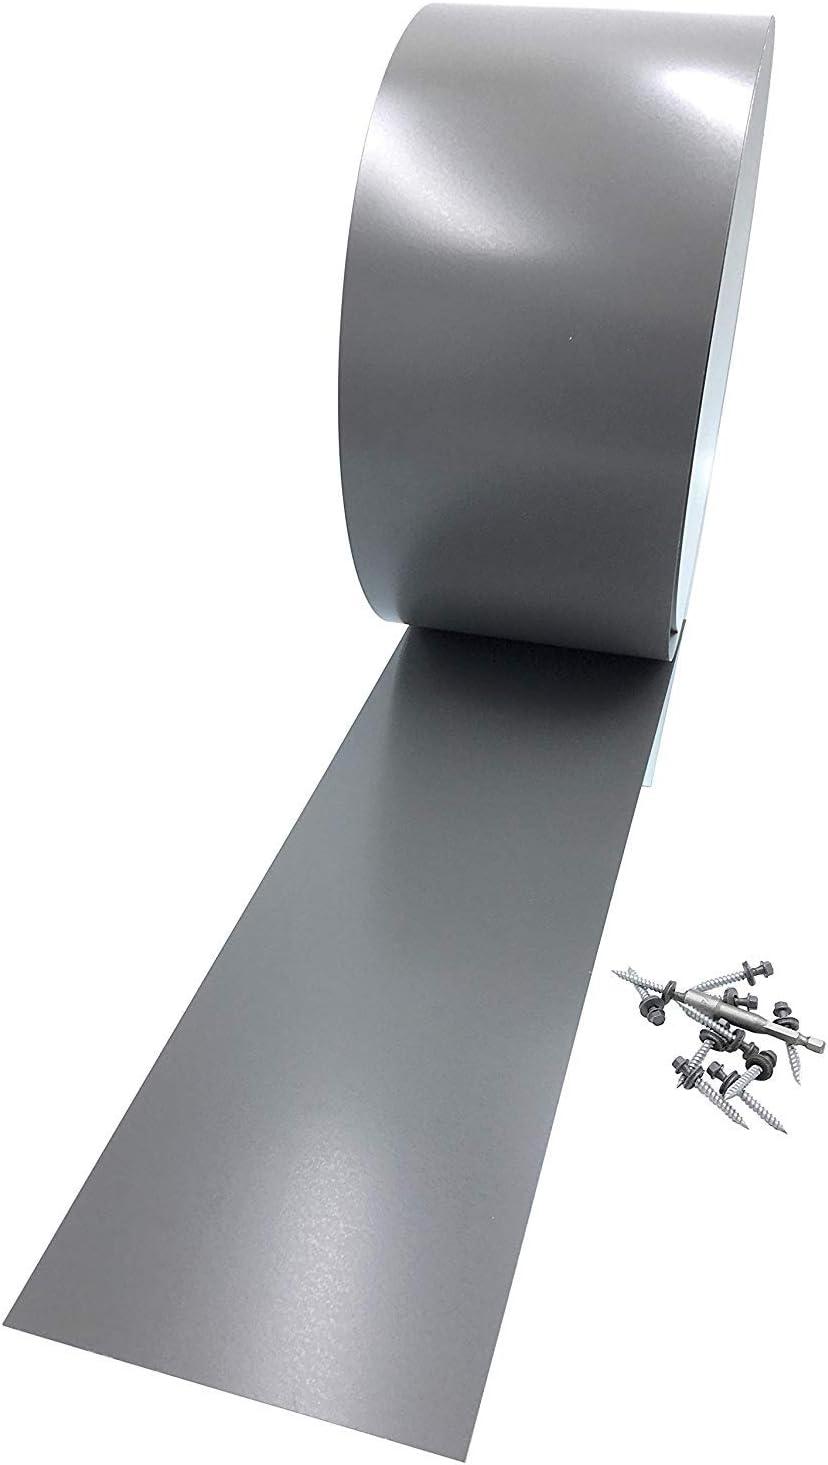 Sheet Metal Roofing siding Screws 2 Inch, Evergreen Metal Roofing Screws Painted Hex Washer Head Sheet Metal Roof Screw 500 Count Self Starting//self Tapping Metal to Wood EAGLE 1